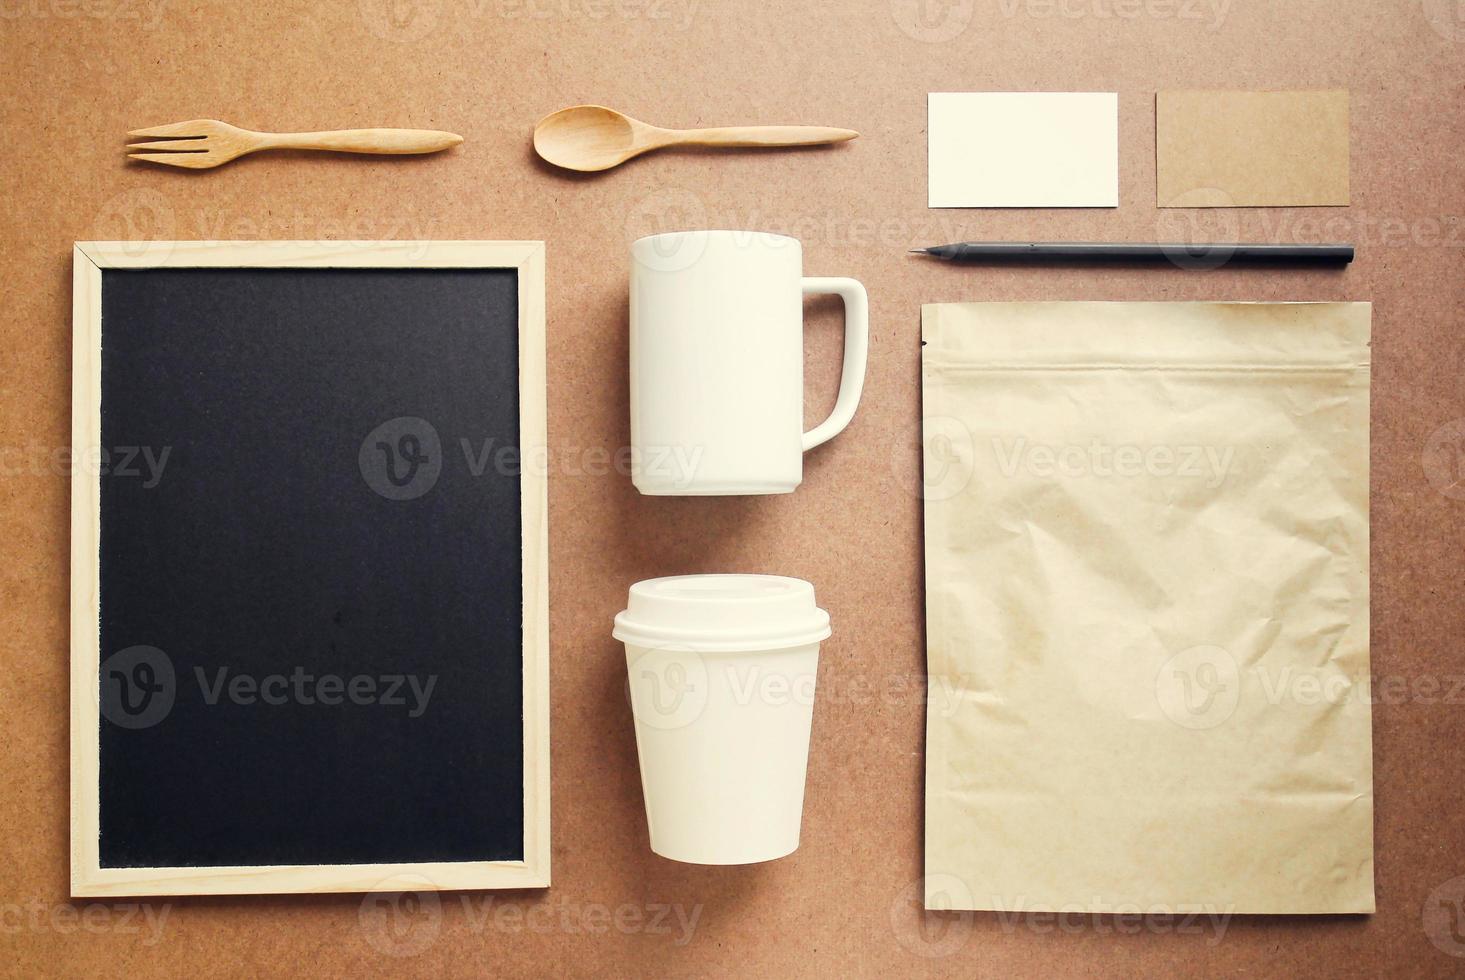 Kaffee-Identity-Branding-Modell mit Retro-Filtereffekt foto